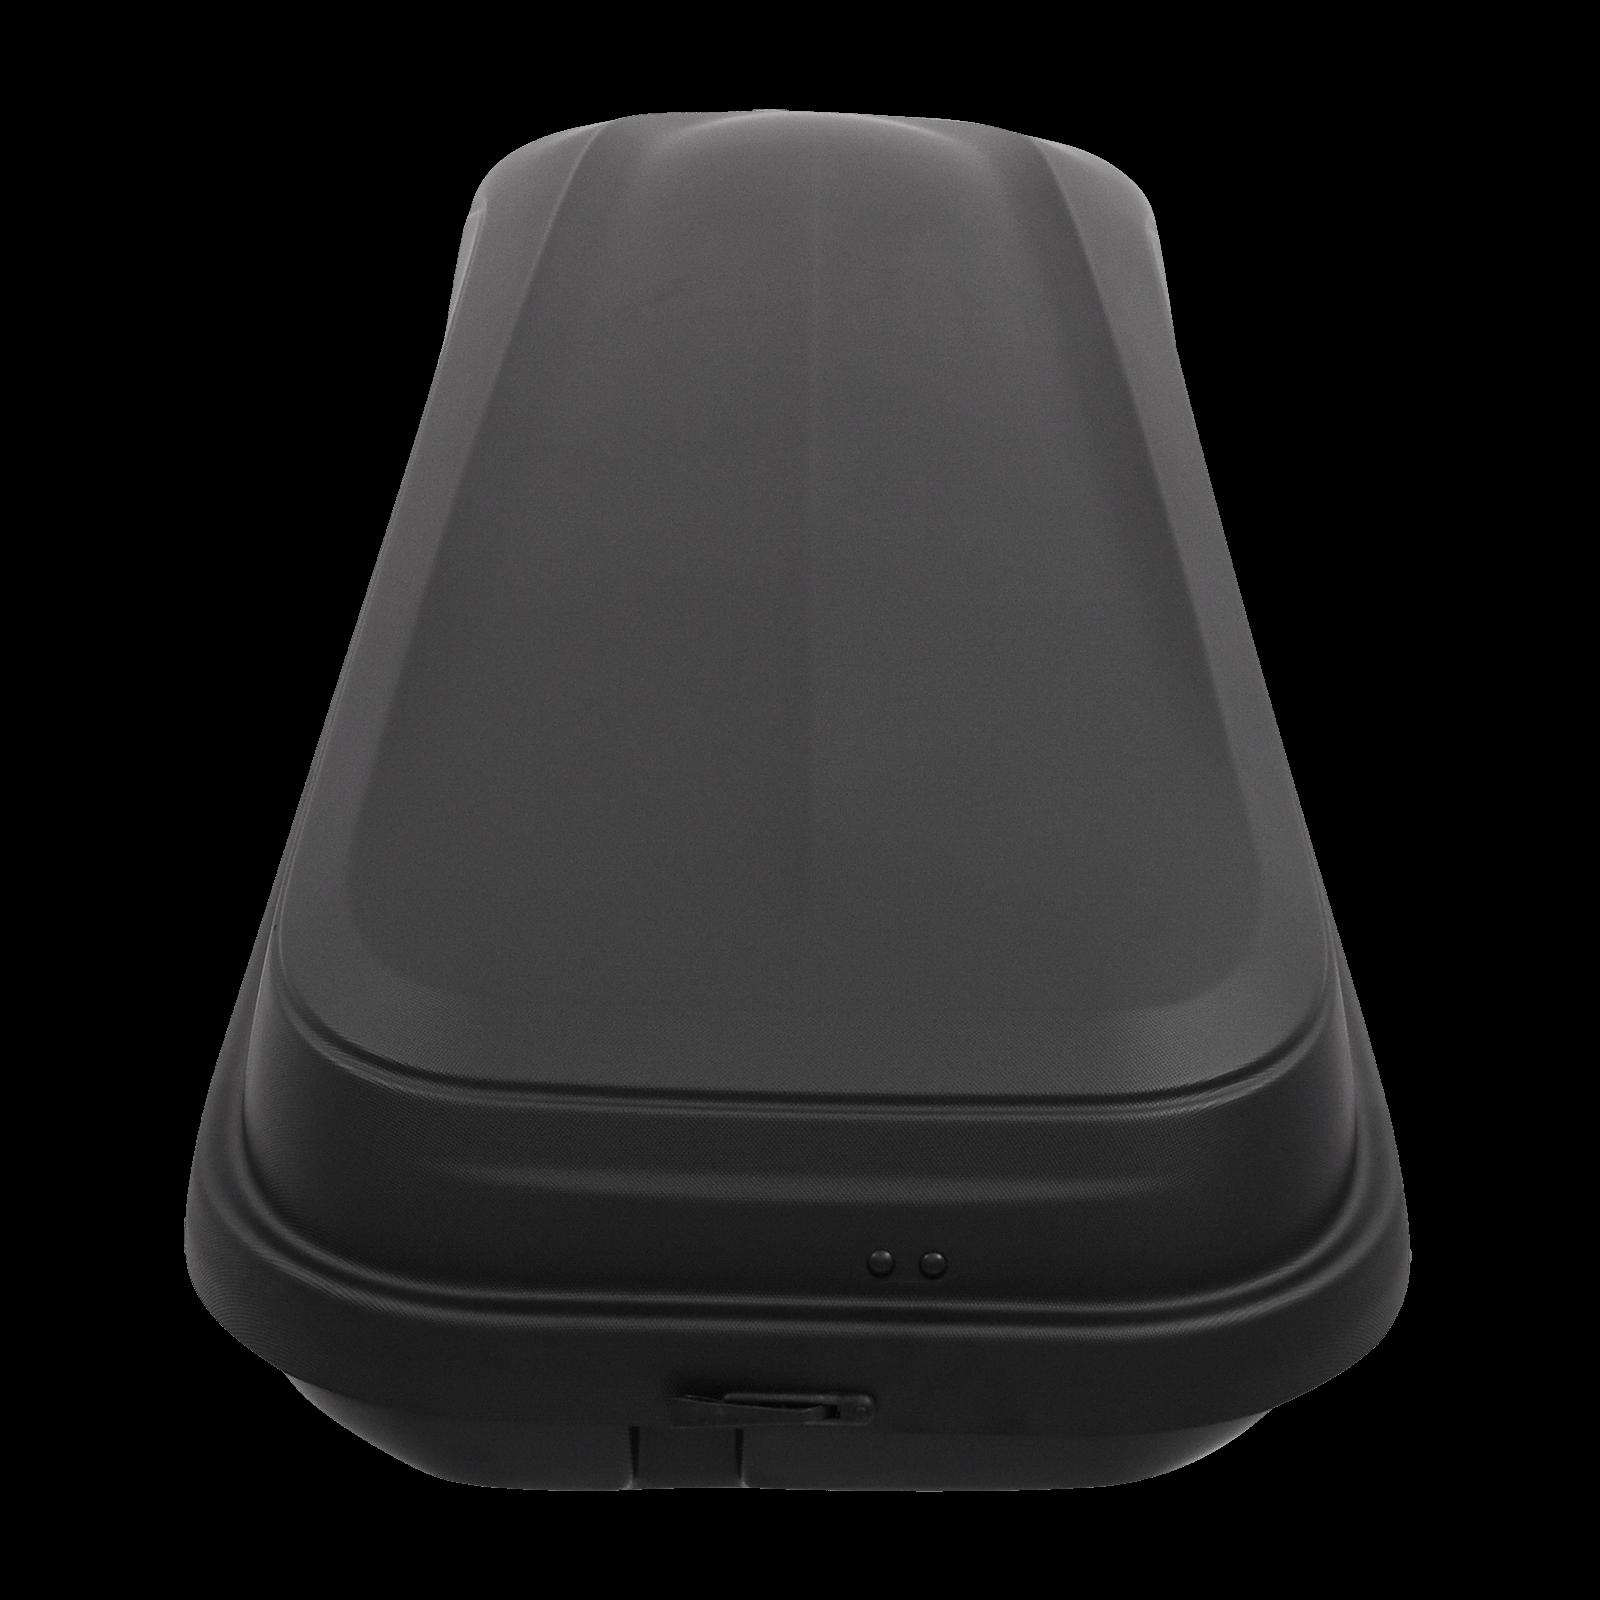 Dachbox Junior Easy 460 schwarz matt - Bild 3